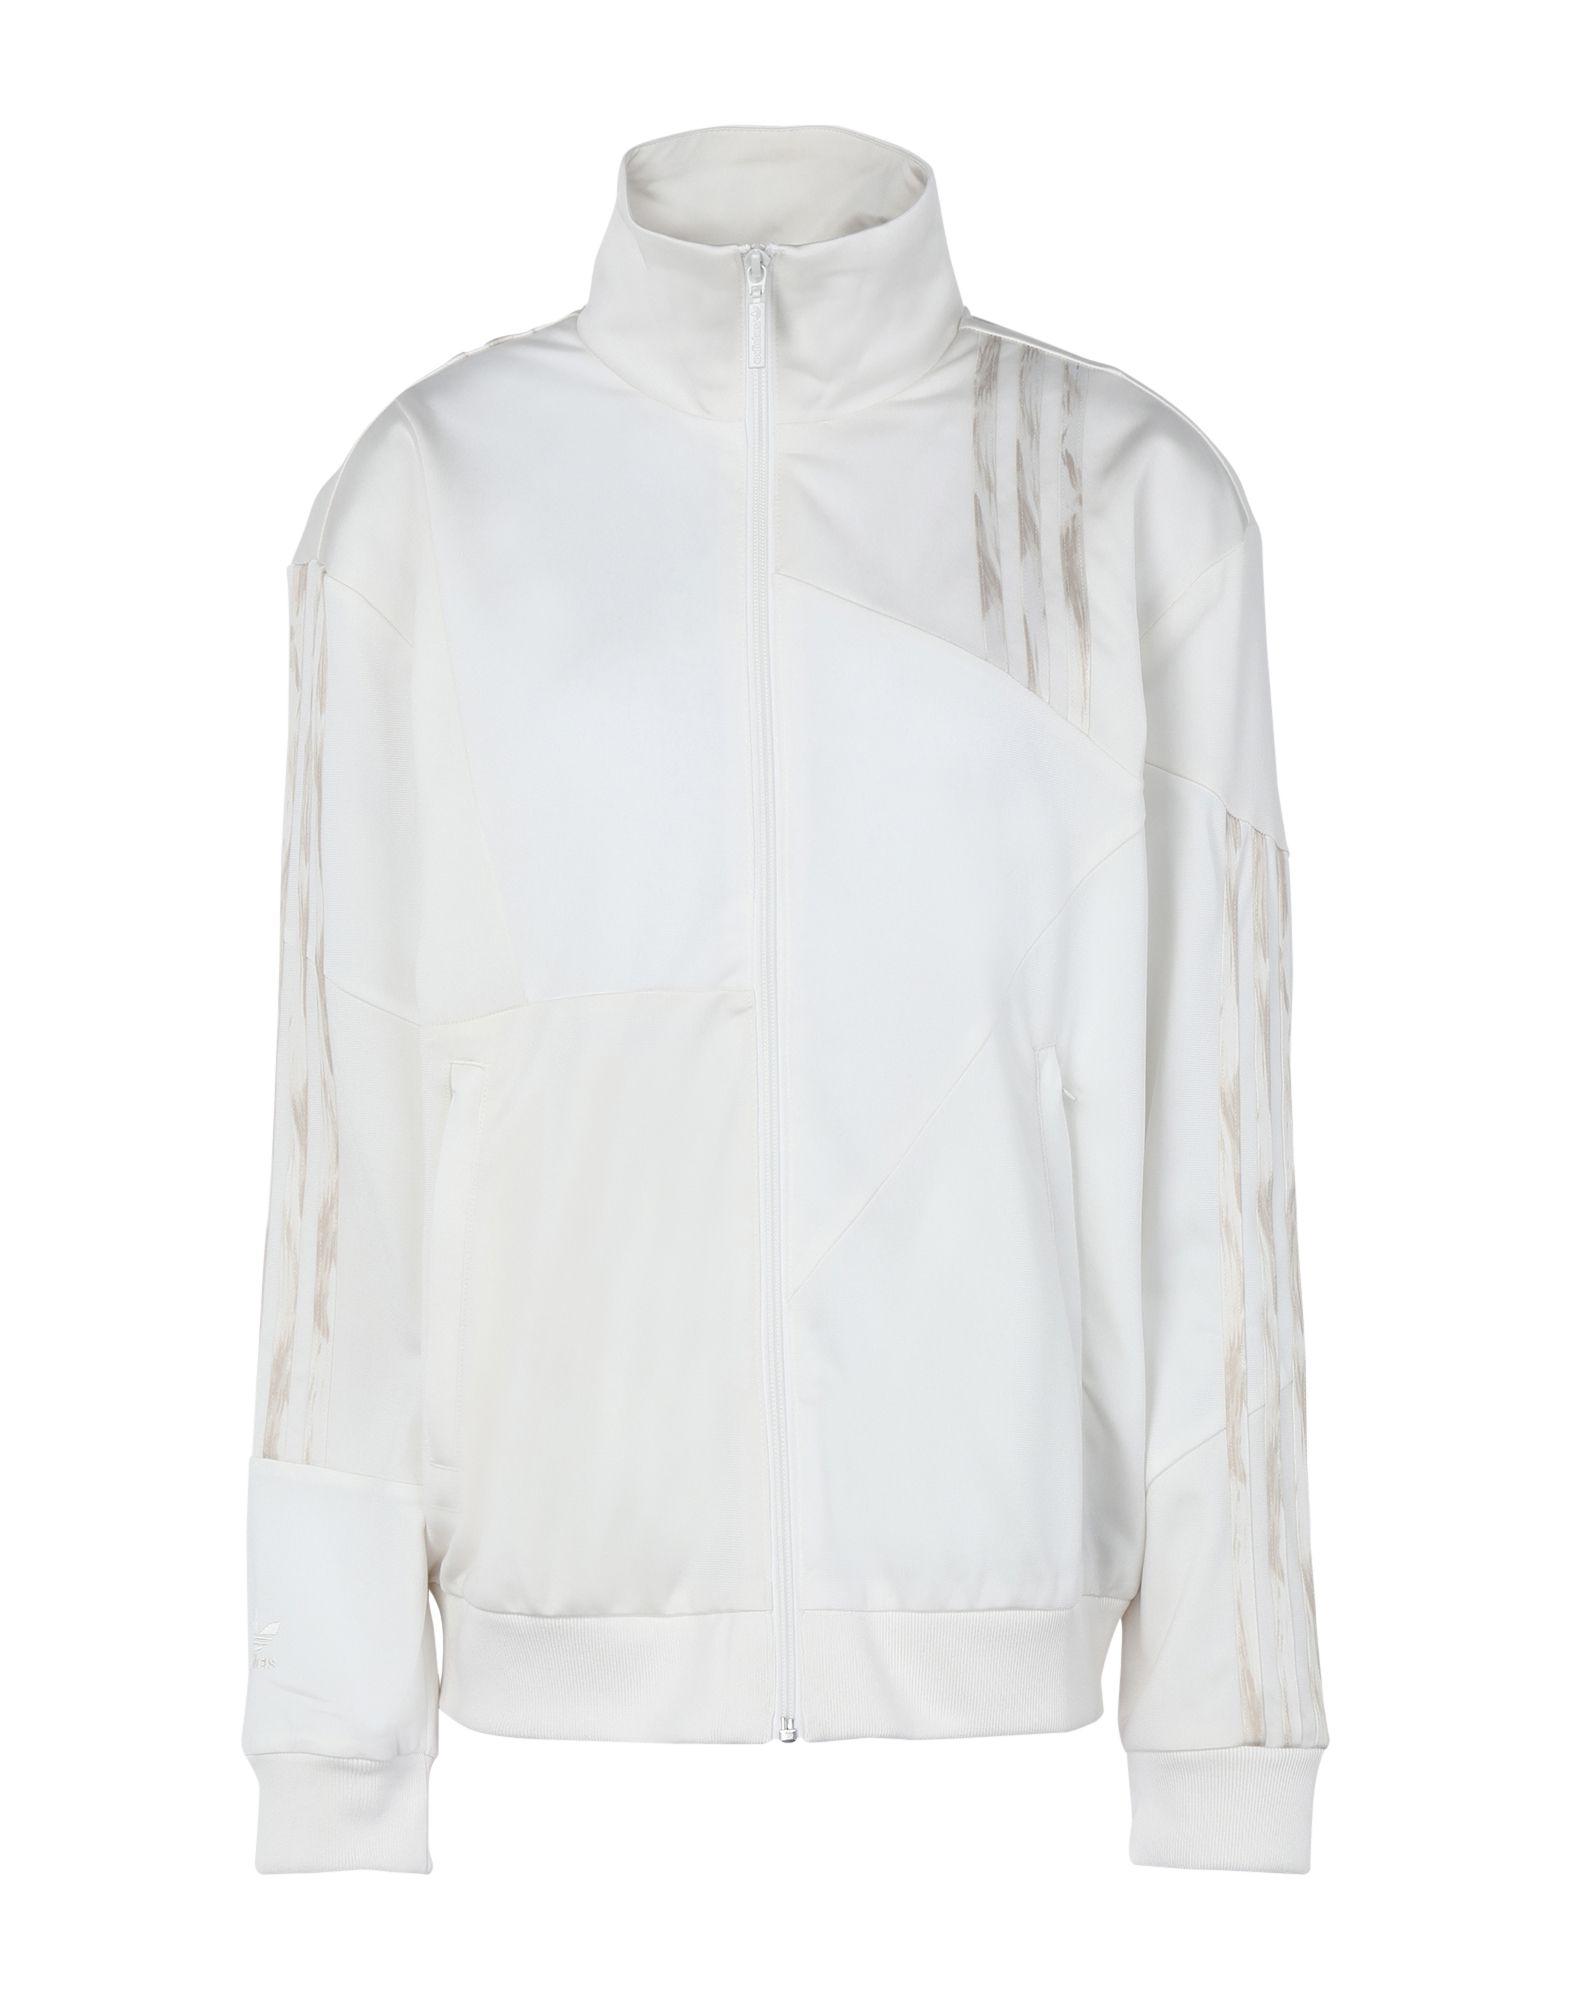 ADIDAS ORIGINALS by DANIËLLE CATHARI Куртка adidas originals by daniëlle cathari топ без рукавов